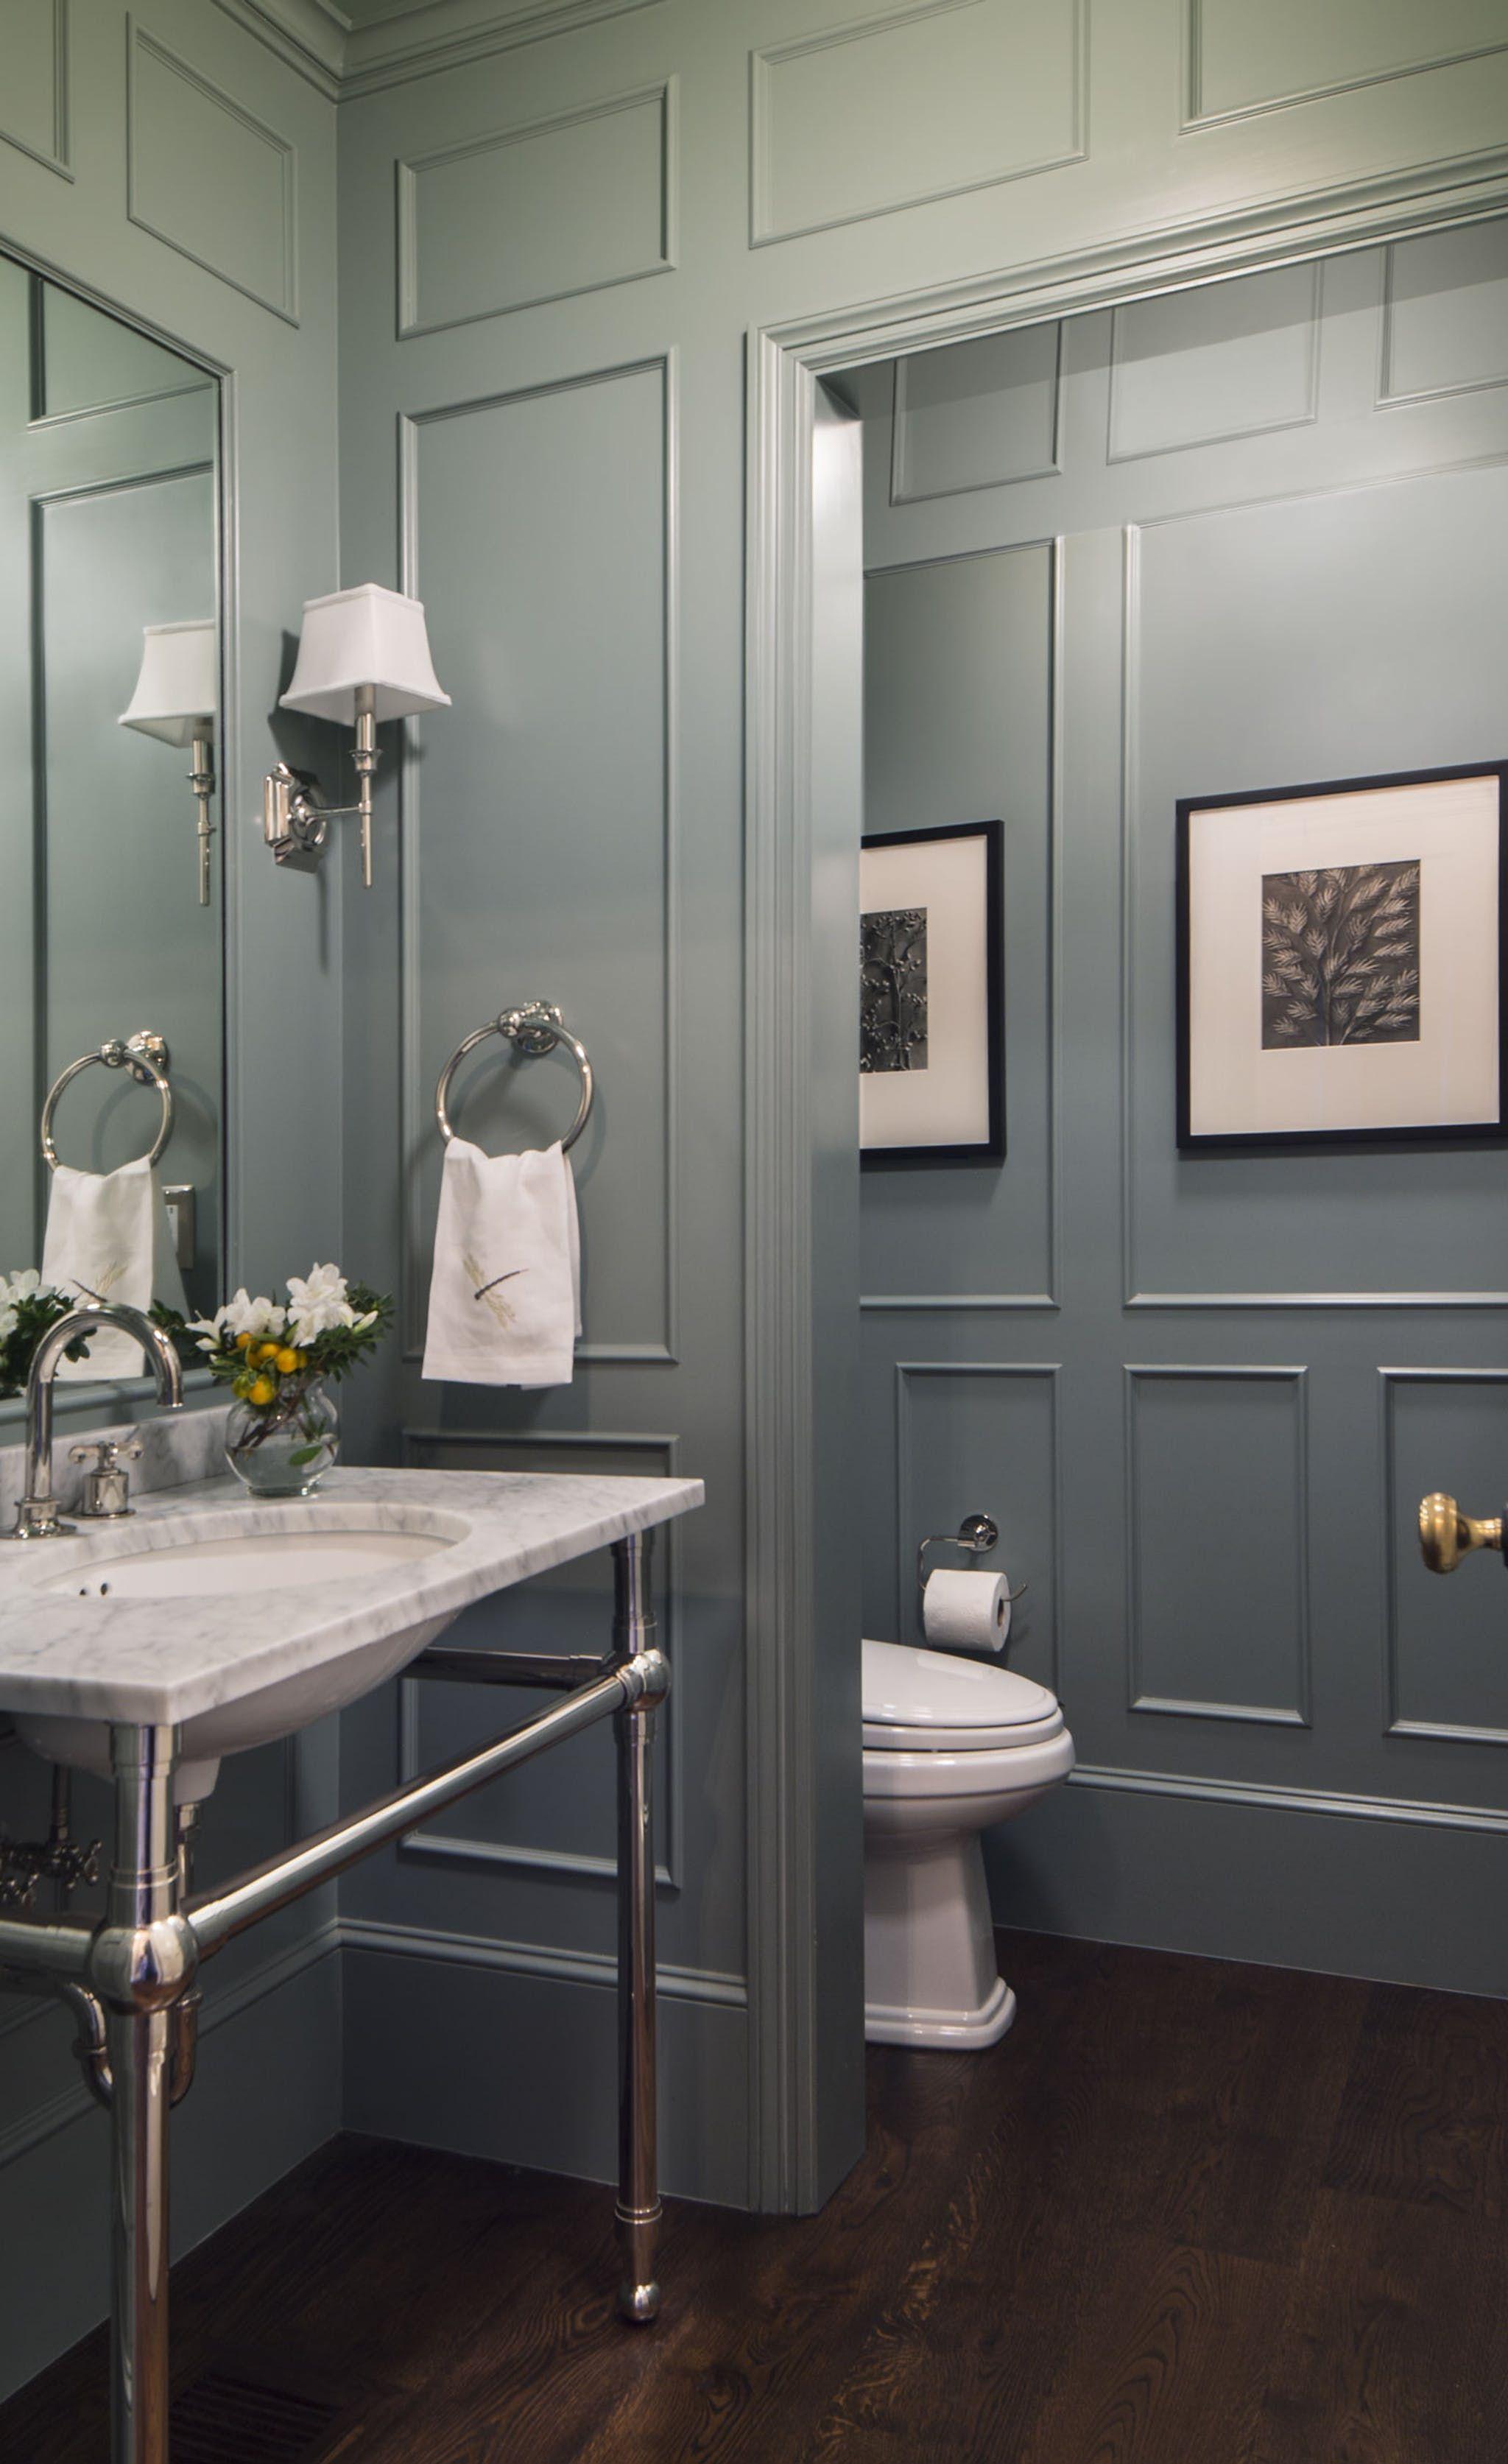 Tim Barber Ltd Portfolio Interiors Bath 1507928183 832638 Interior